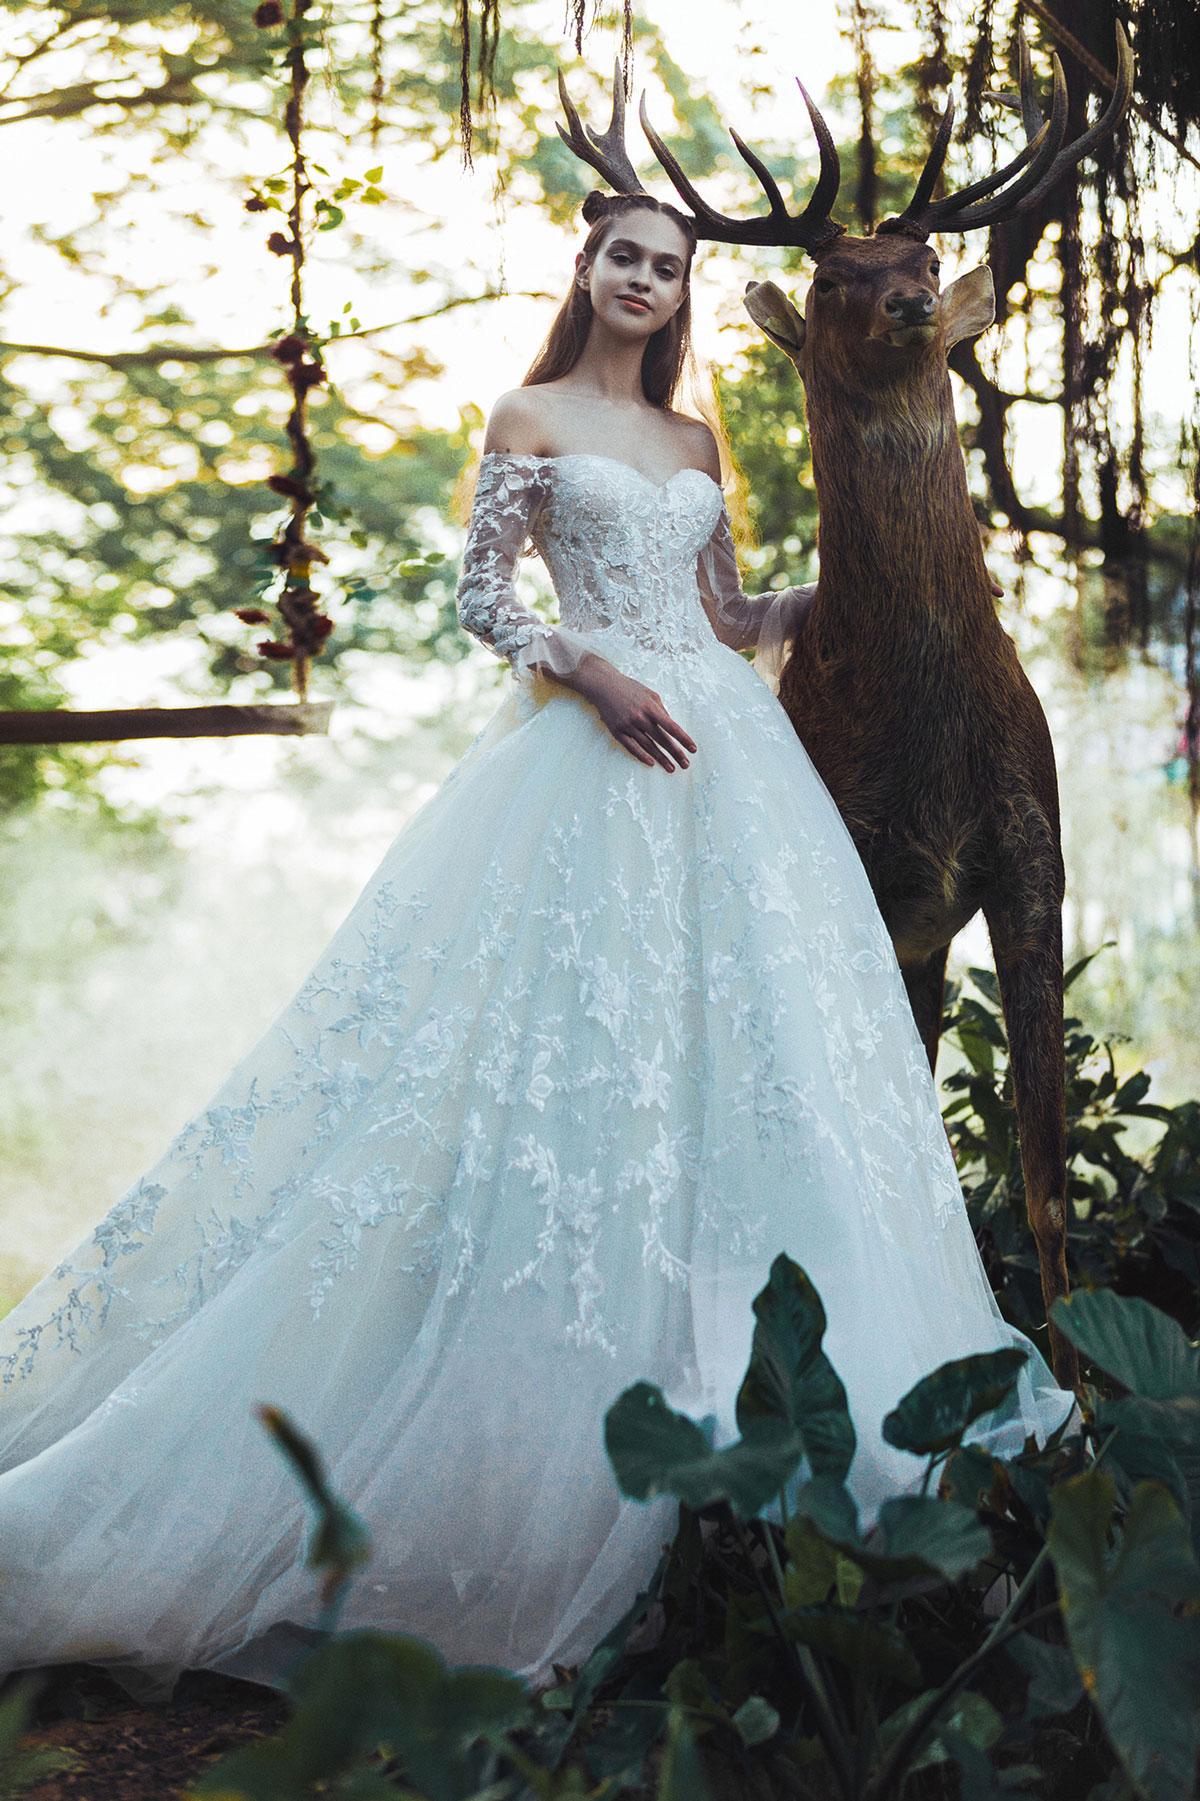 off-the-shoulder-sweetheart-wedding-dress.jpg